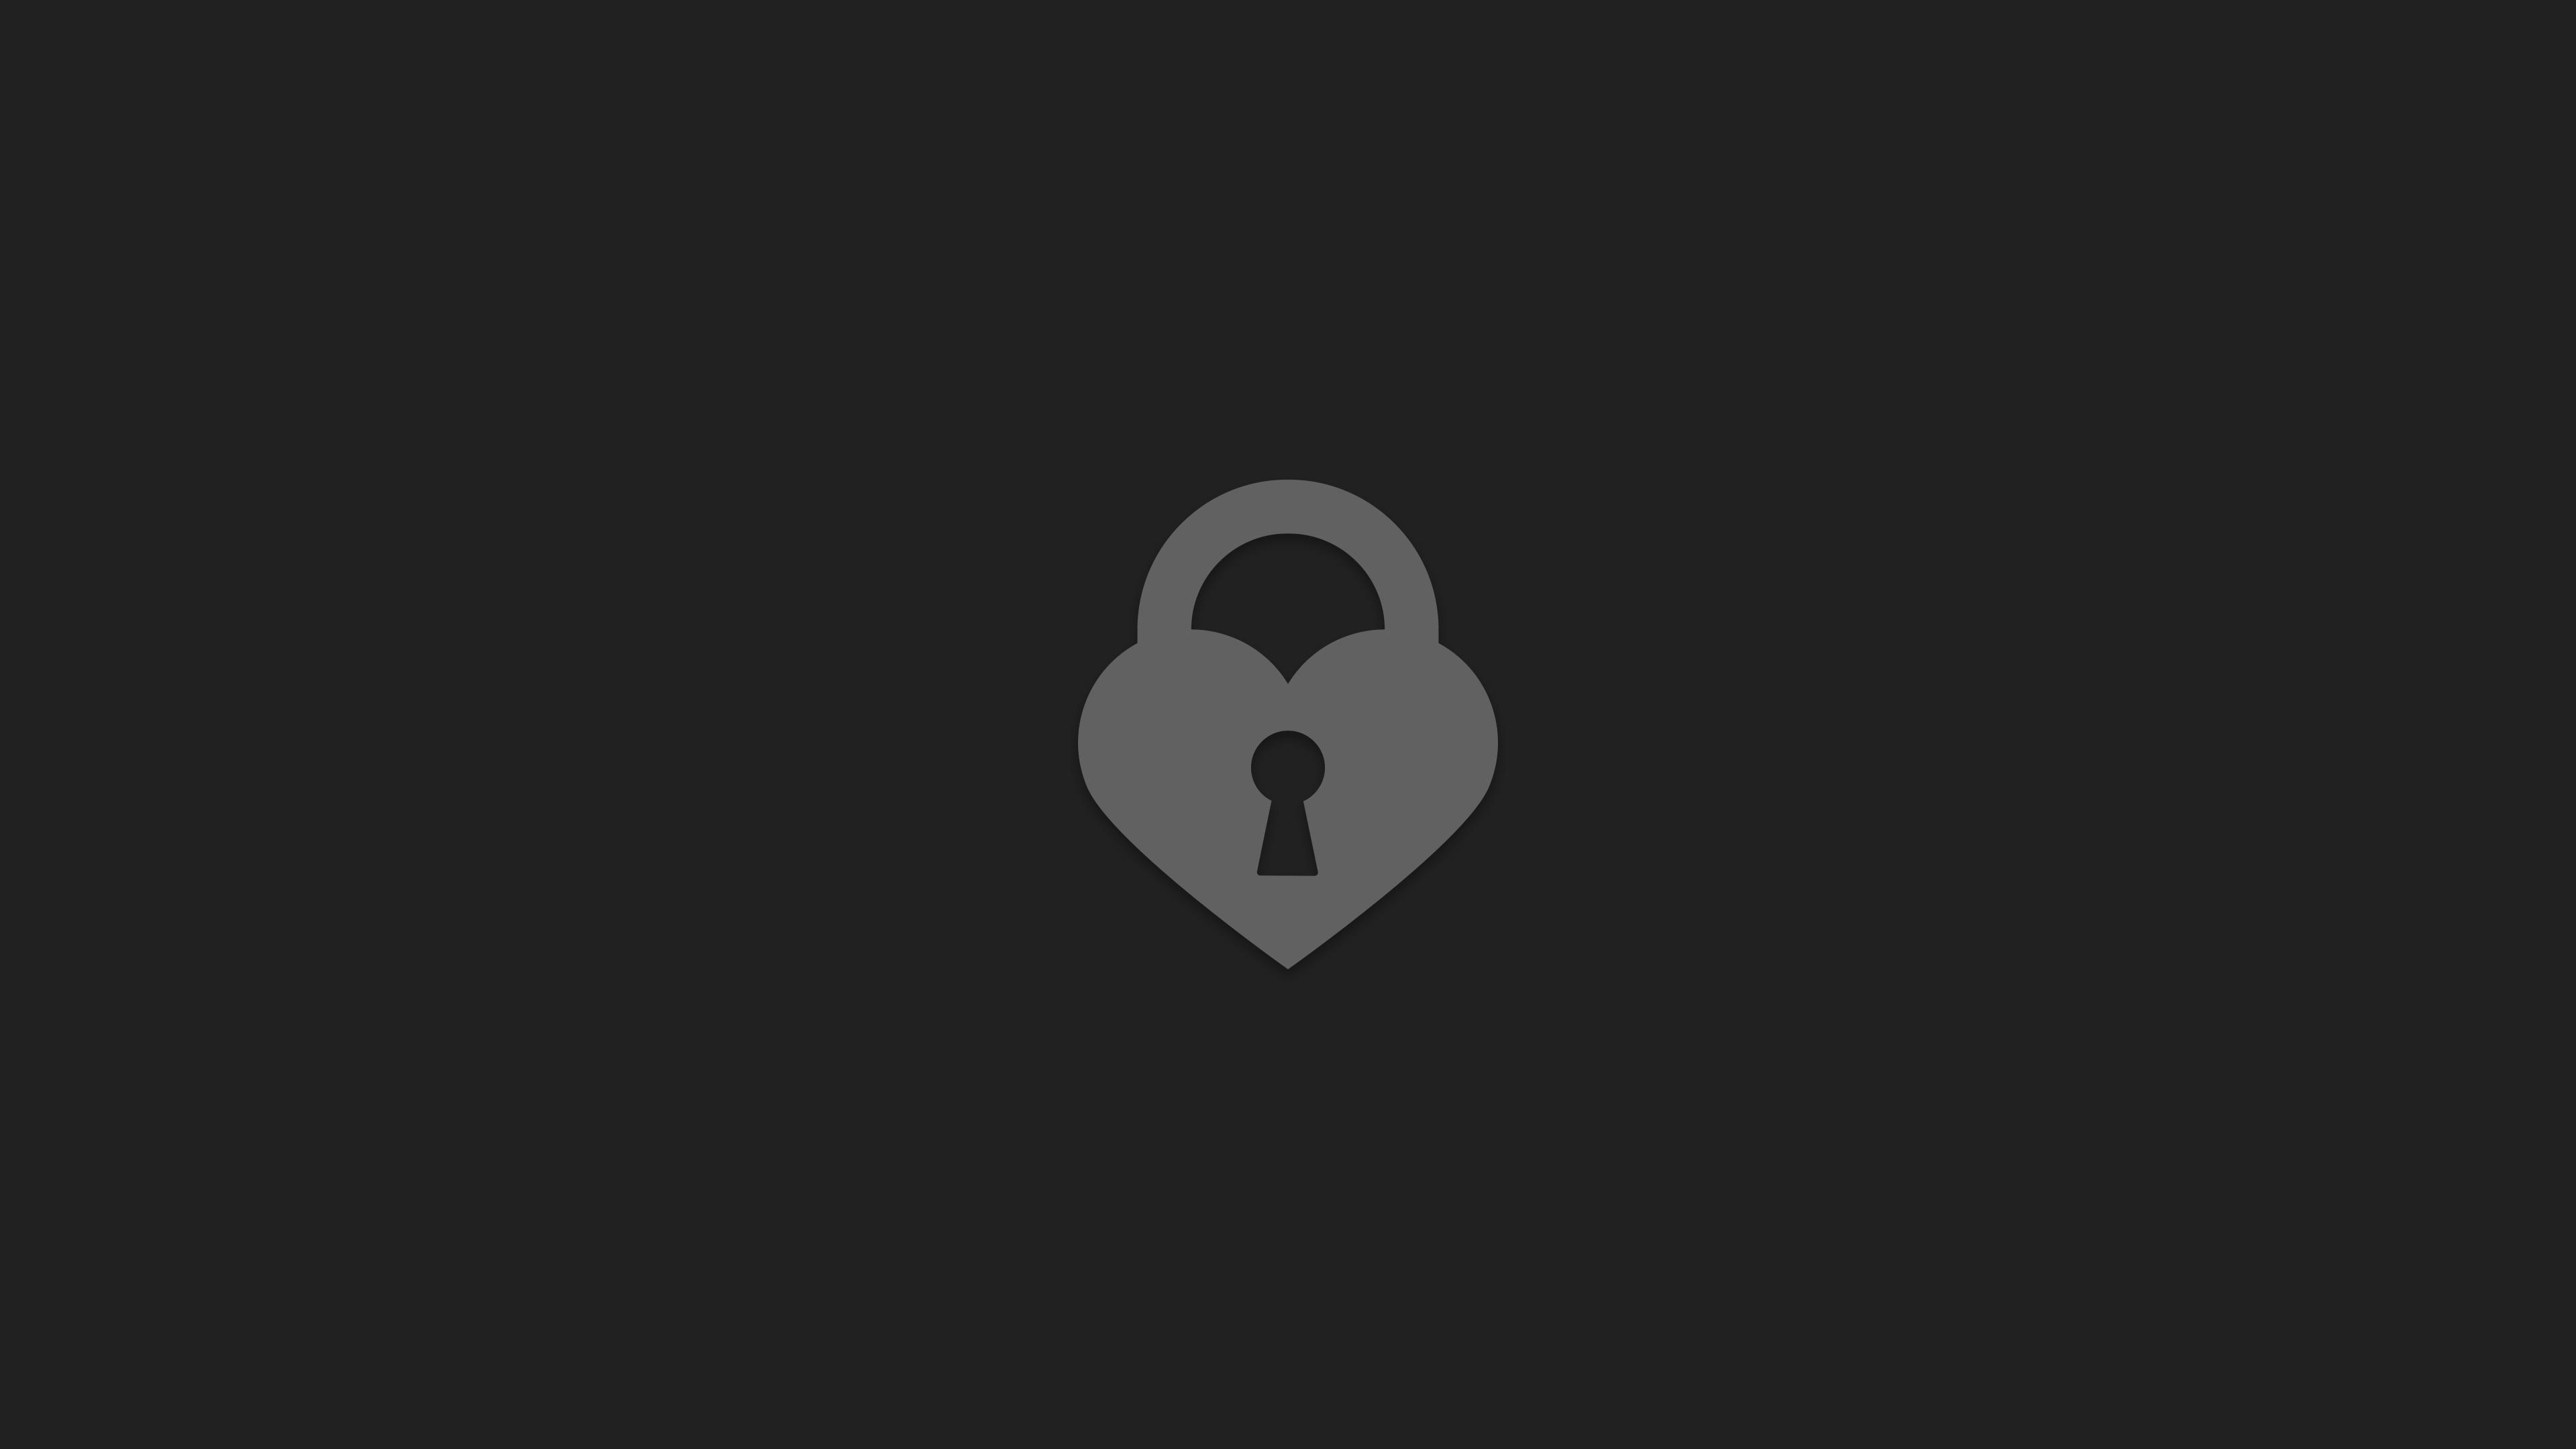 heart lock minimalist 4k 1540751637 - Heart Lock Minimalist 4k - minimalist wallpapers, minimalism wallpapers, lock wallpapers, heart wallpapers, hd-wallpapers, digital art wallpapers, artwork wallpapers, artist wallpapers